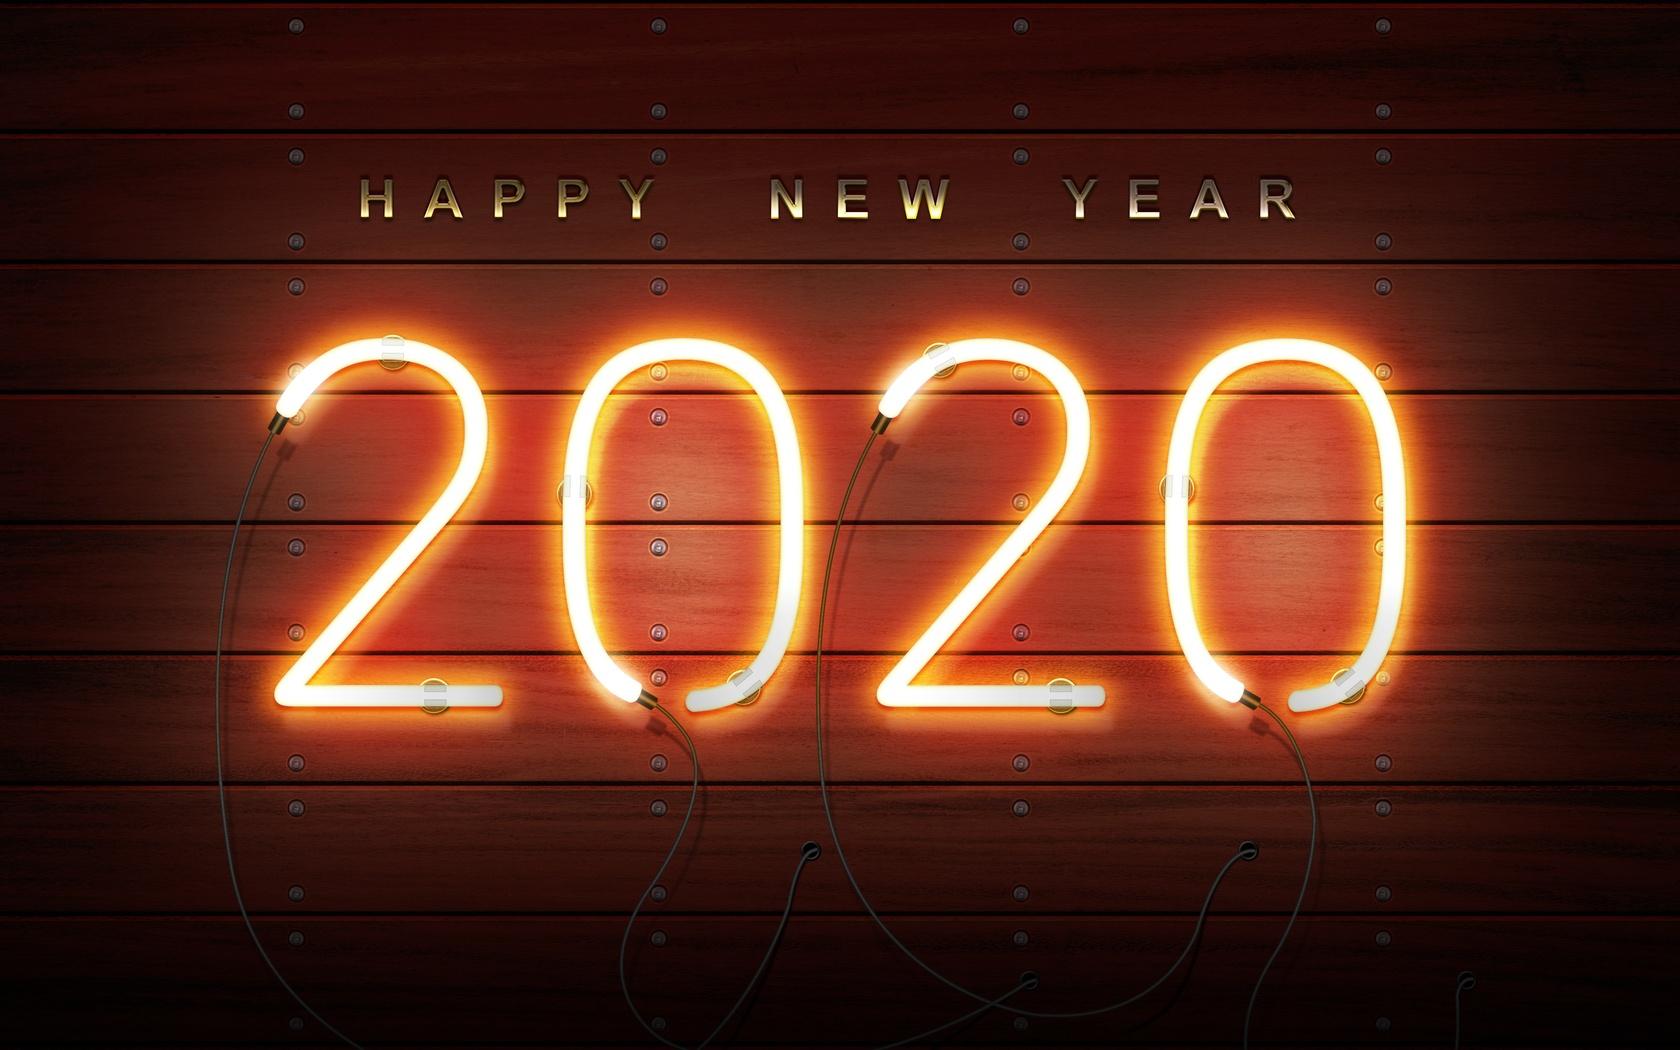 happy-new-year-2020-xf.jpg